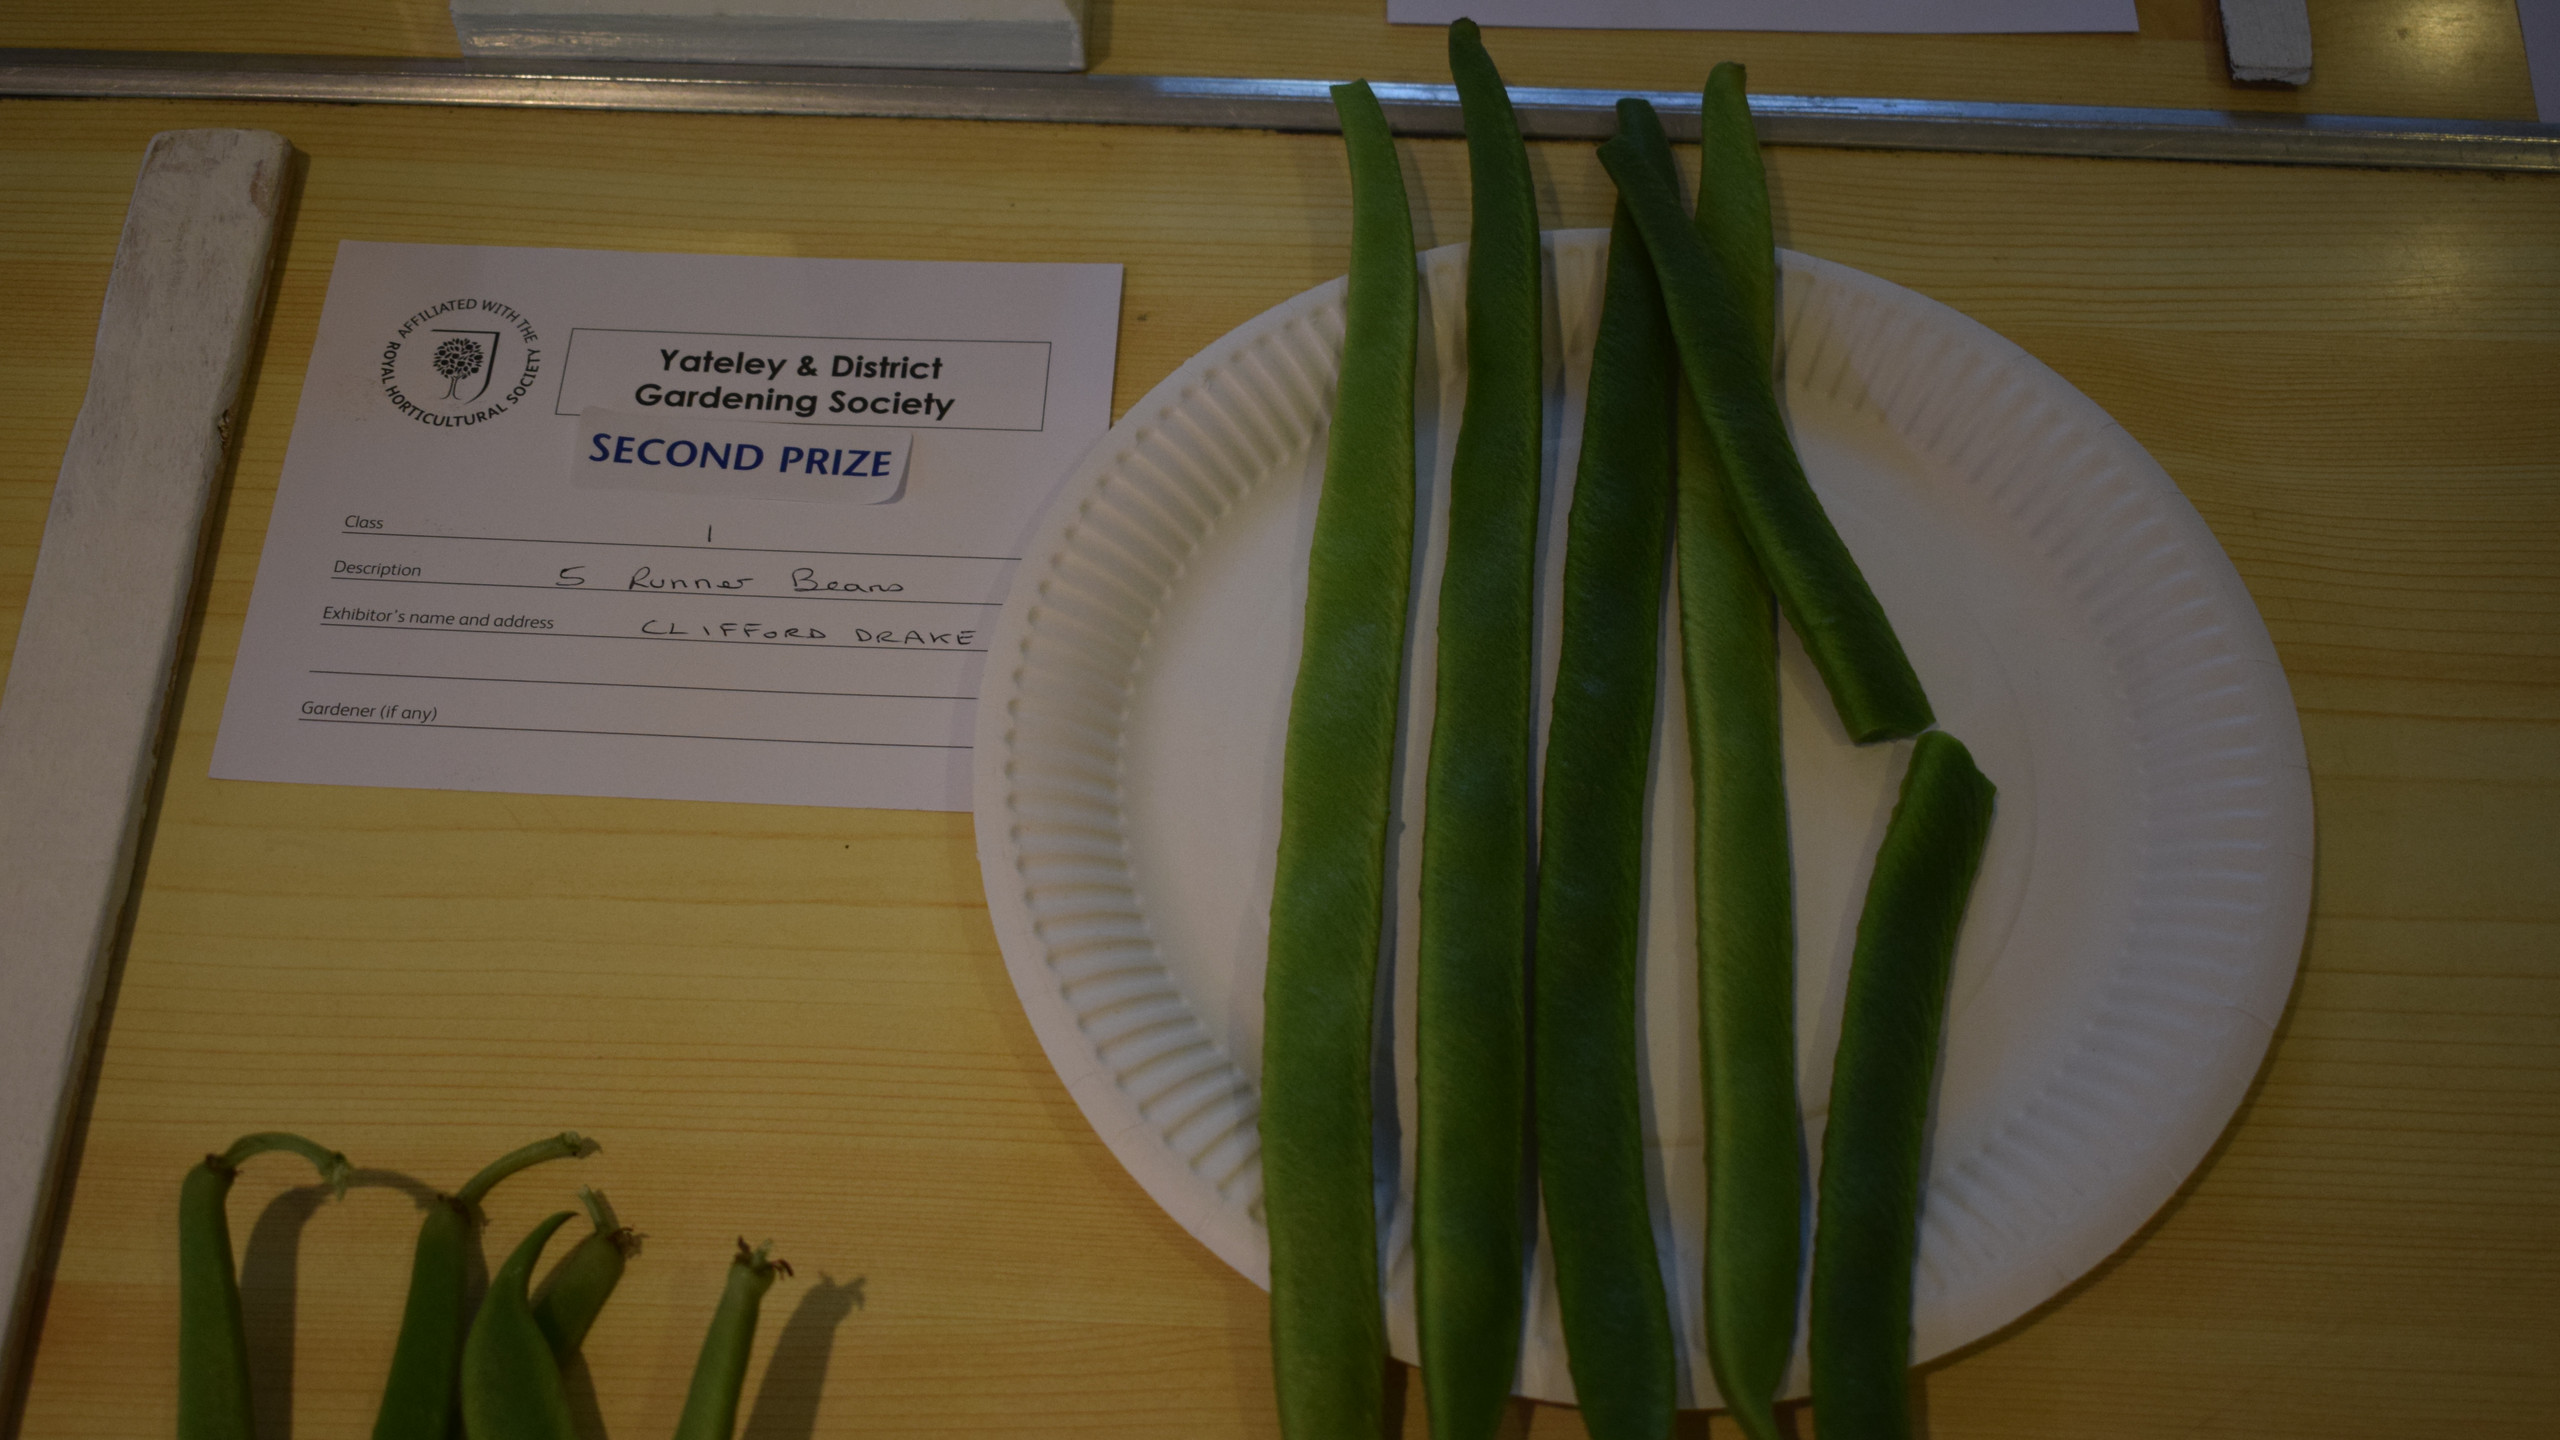 2nd prize for 5 runner beans